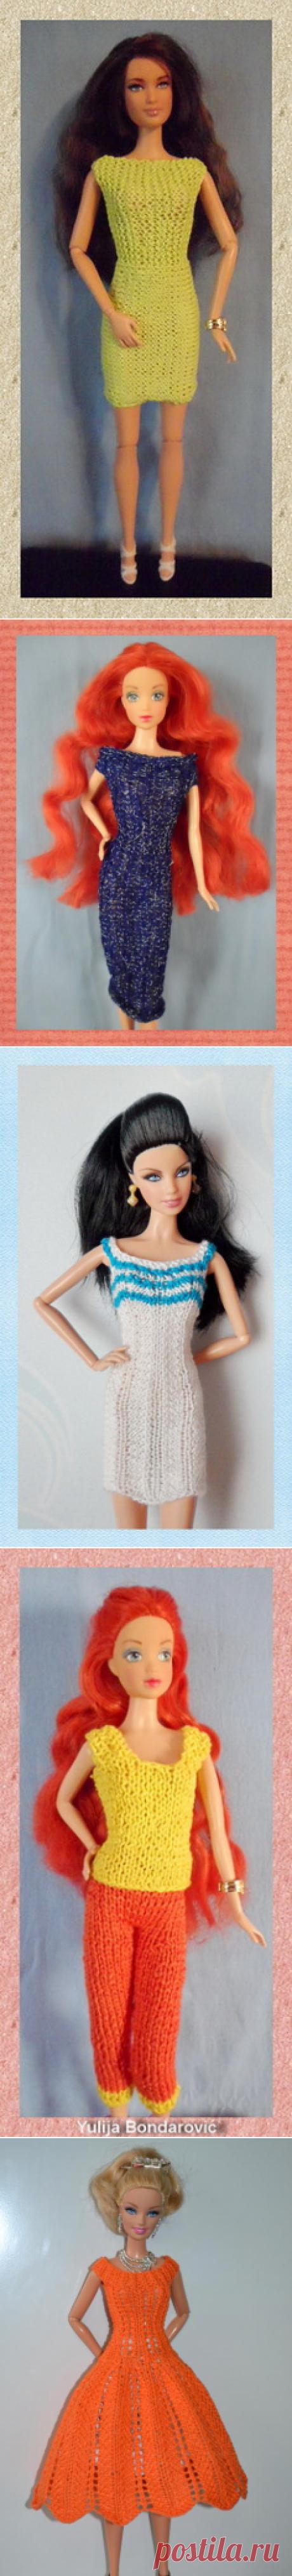 Sticka till Barbie - вяжем спицами - Kimberly Club. Одежда для кукол.